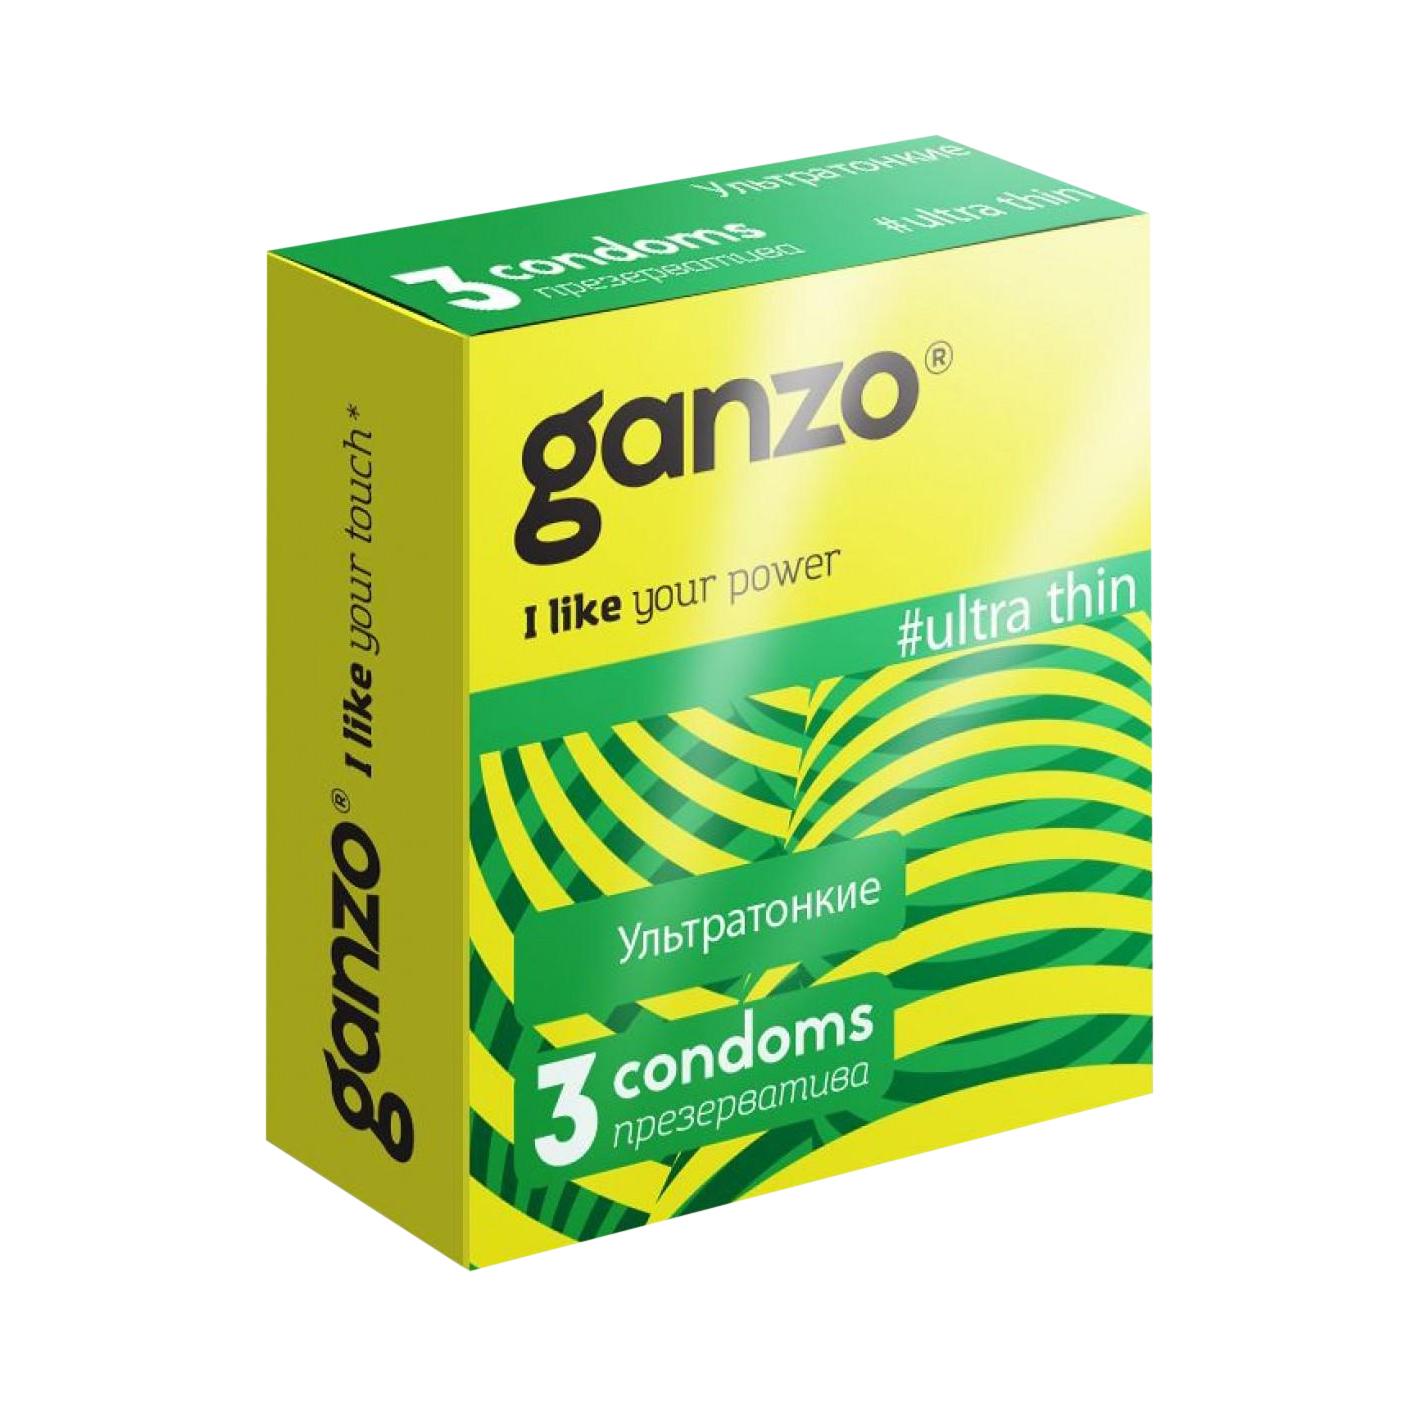 Презервативы Ganzo ultra thin ультратонкие 3 шт